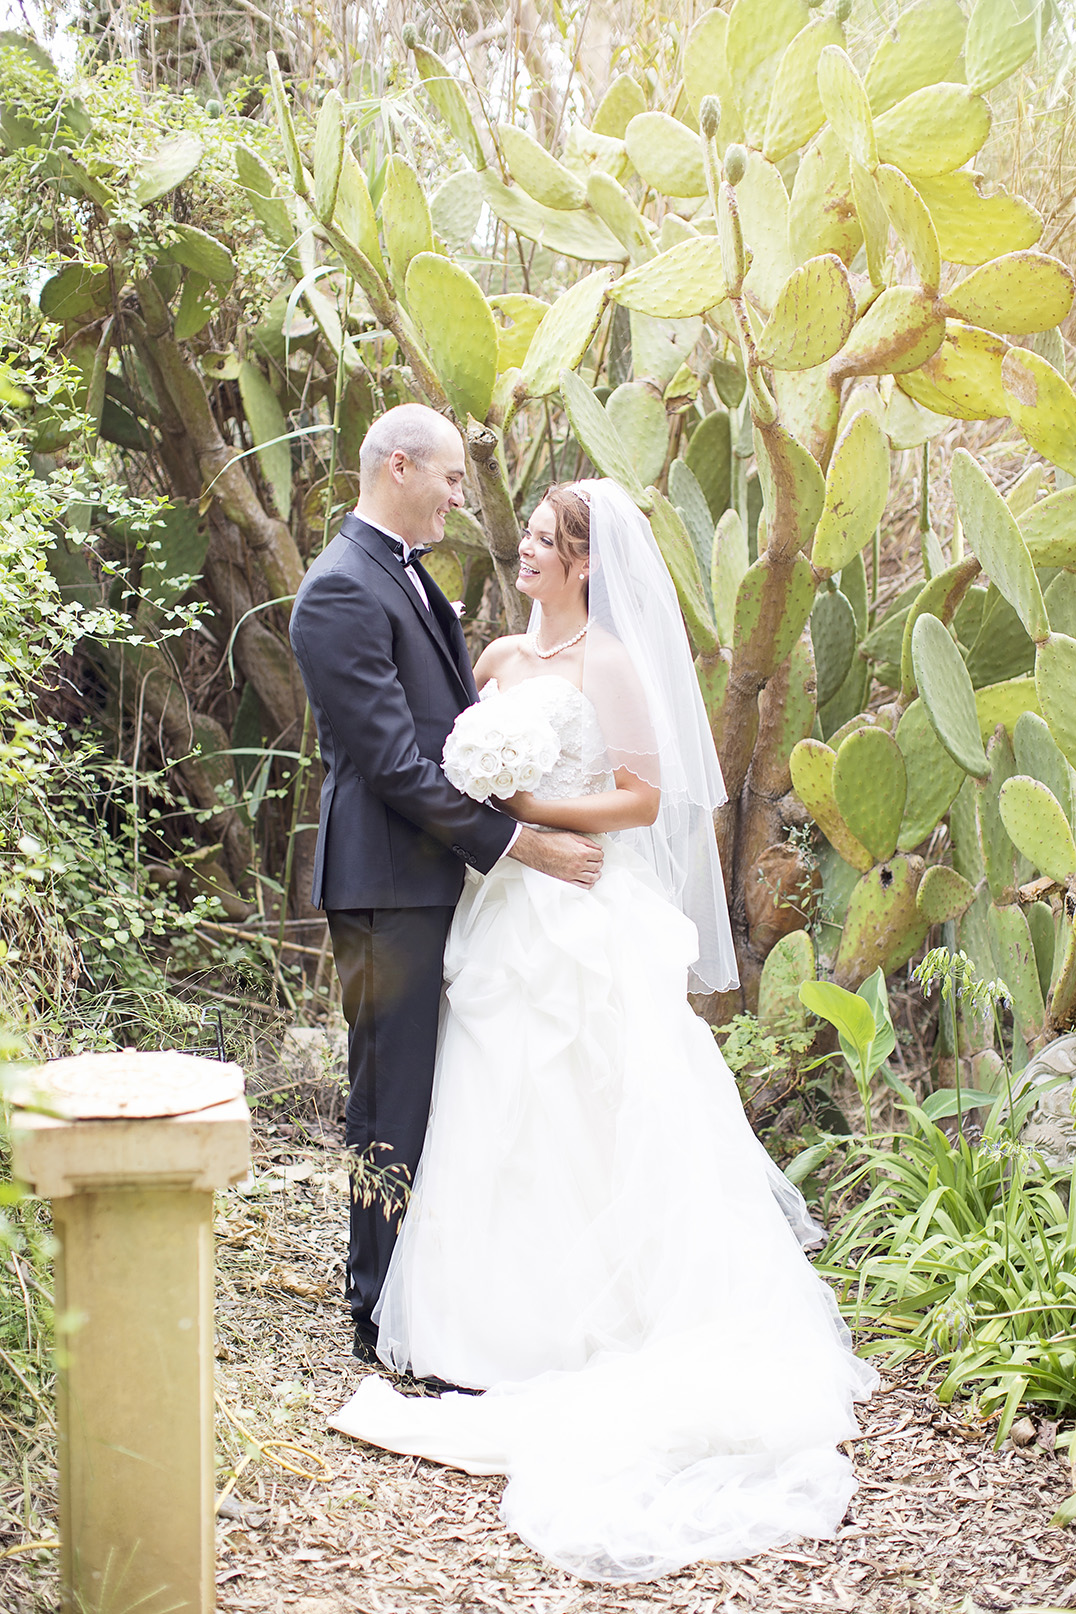 One Tree Hill Wedding Photography Art Through Da Vinces Eyes 11.jpg